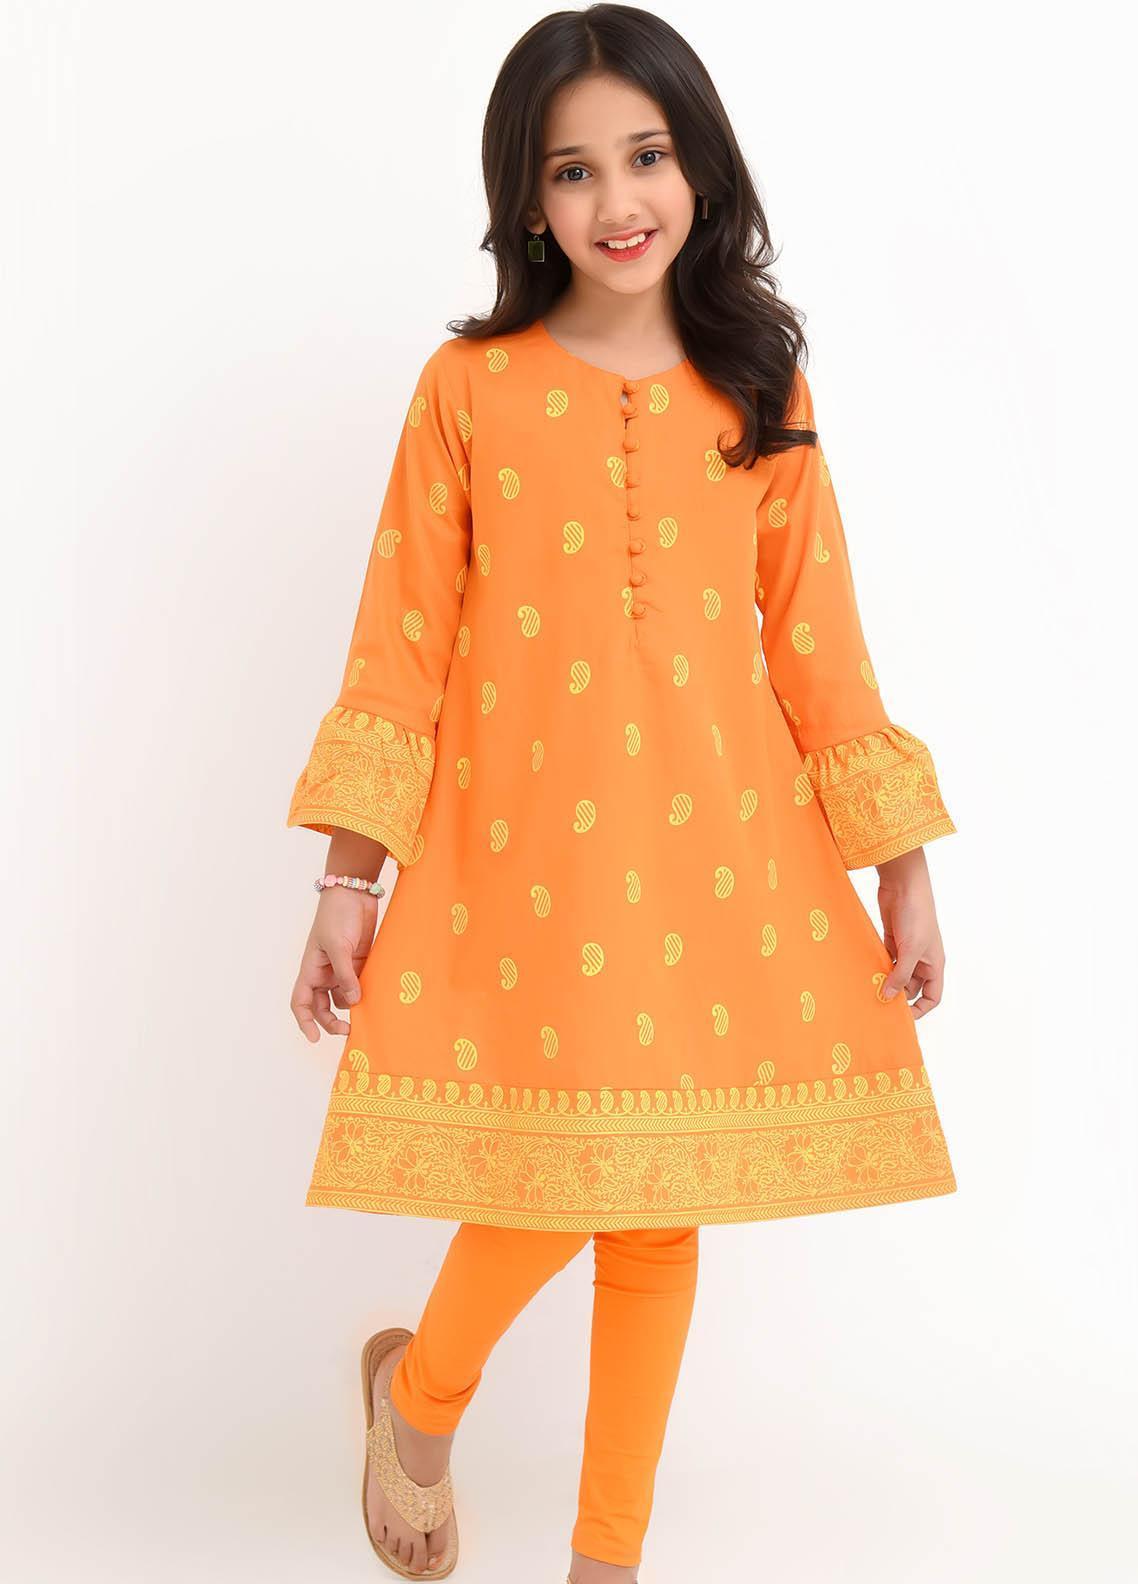 Ochre Cotton Fancy Girls Kurtis -  OFK 753 Orange